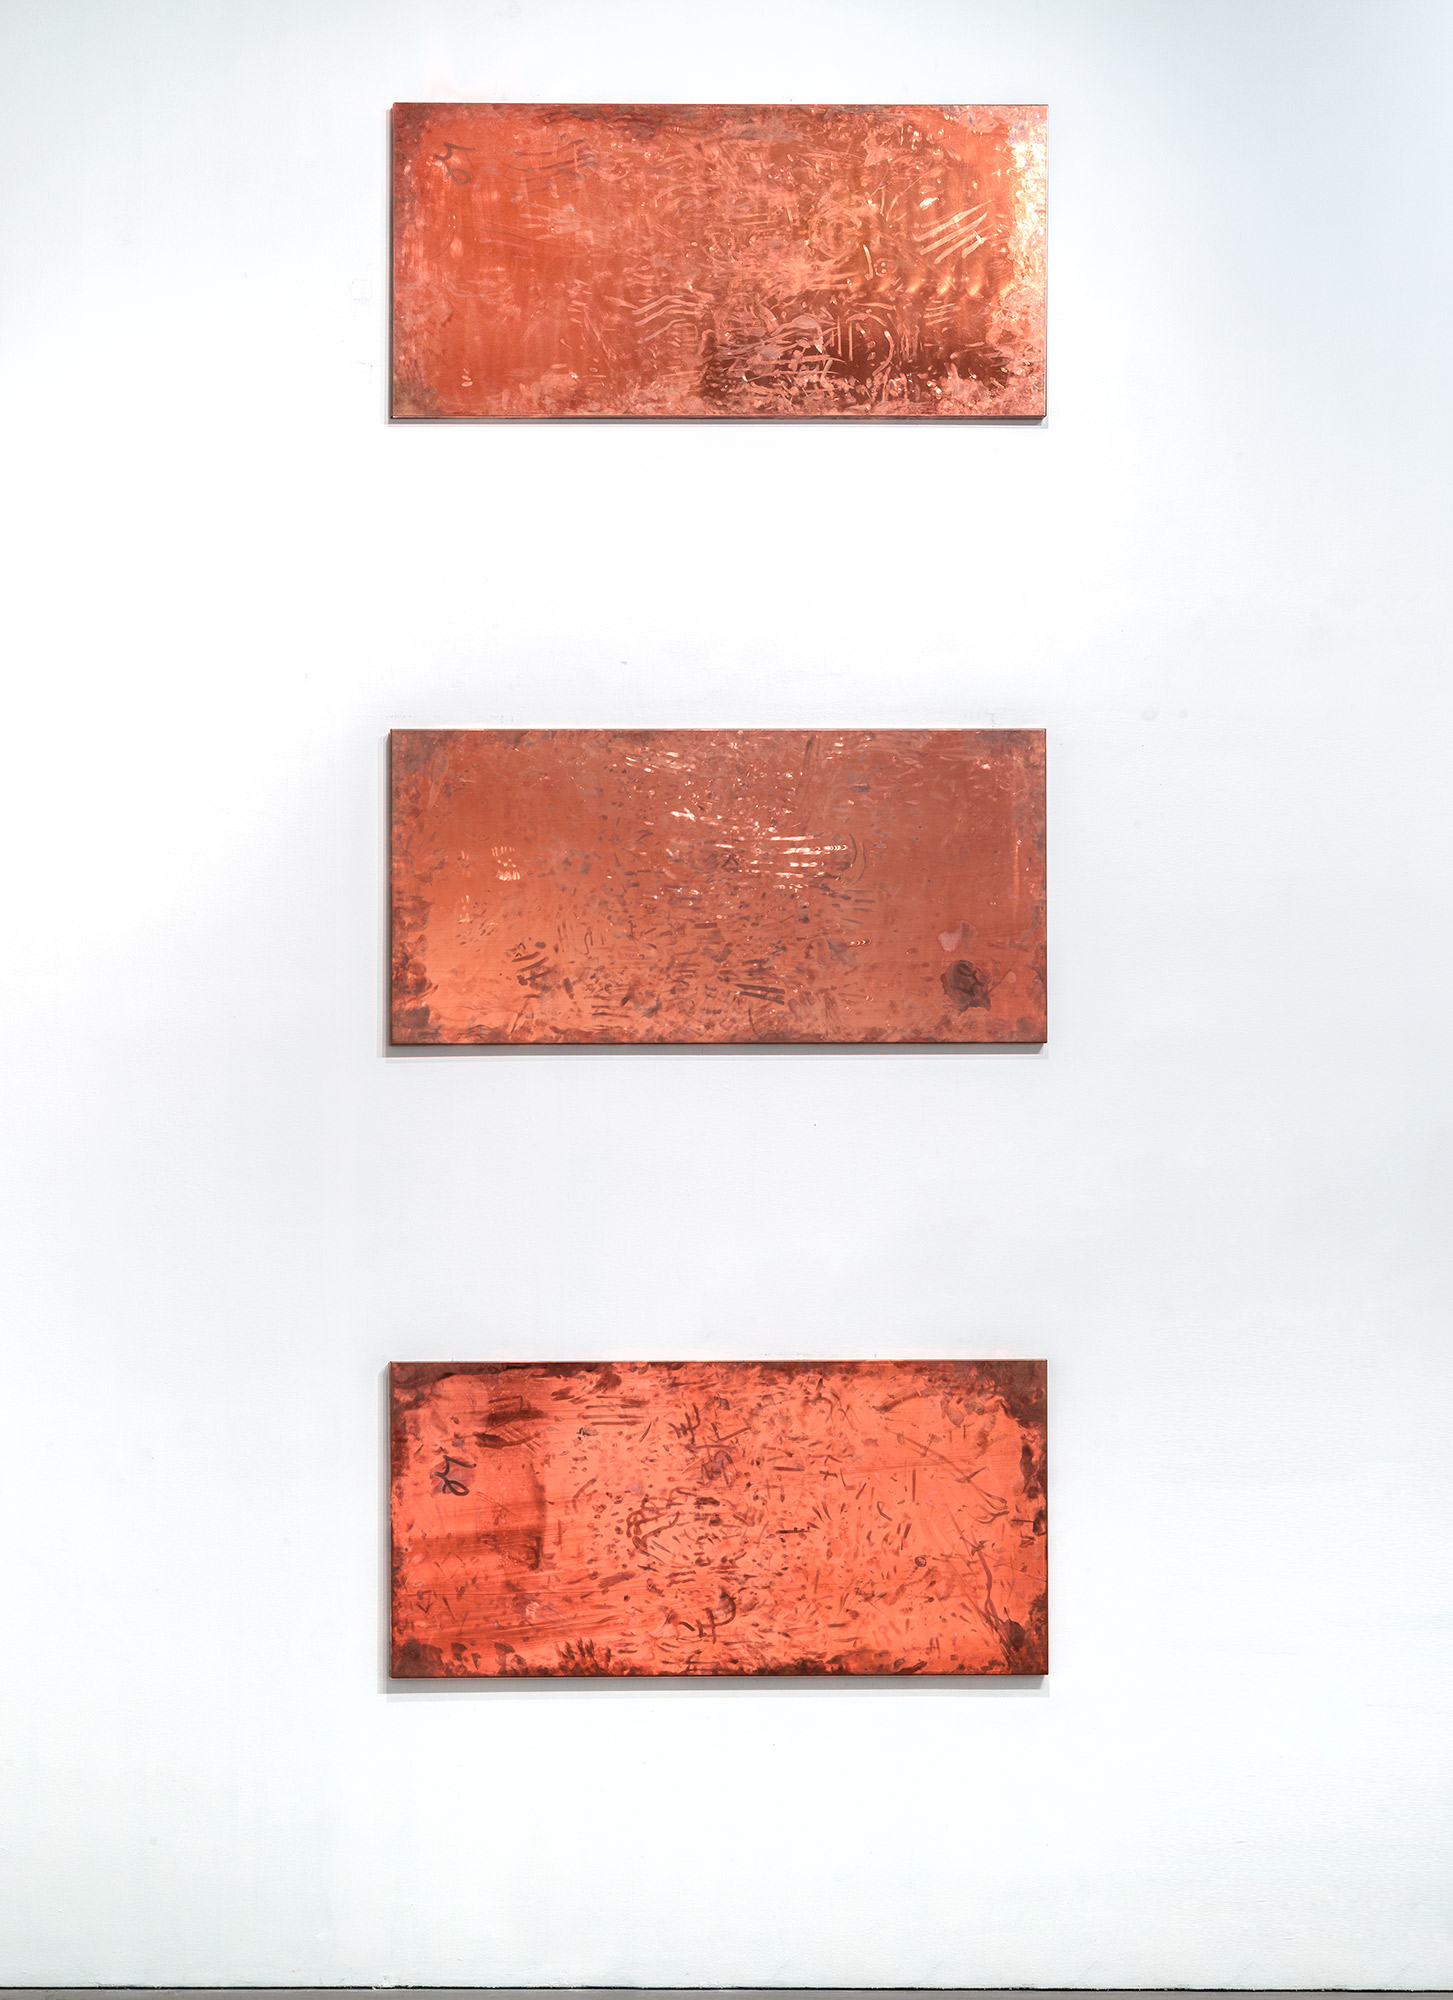 Copper Surrogates (September 20–23/November 21–23, 2011, Beijing, China, June 13–18/November 21, 2012Los Angeles, California, November 29–December 3, 2012, Miami Beach, Florida)    2011   Polished copper  35 1/2 x 74 3/4 x 1 1/2 inches each   Surrogates (Full Sheet, Art Handling), 2011–